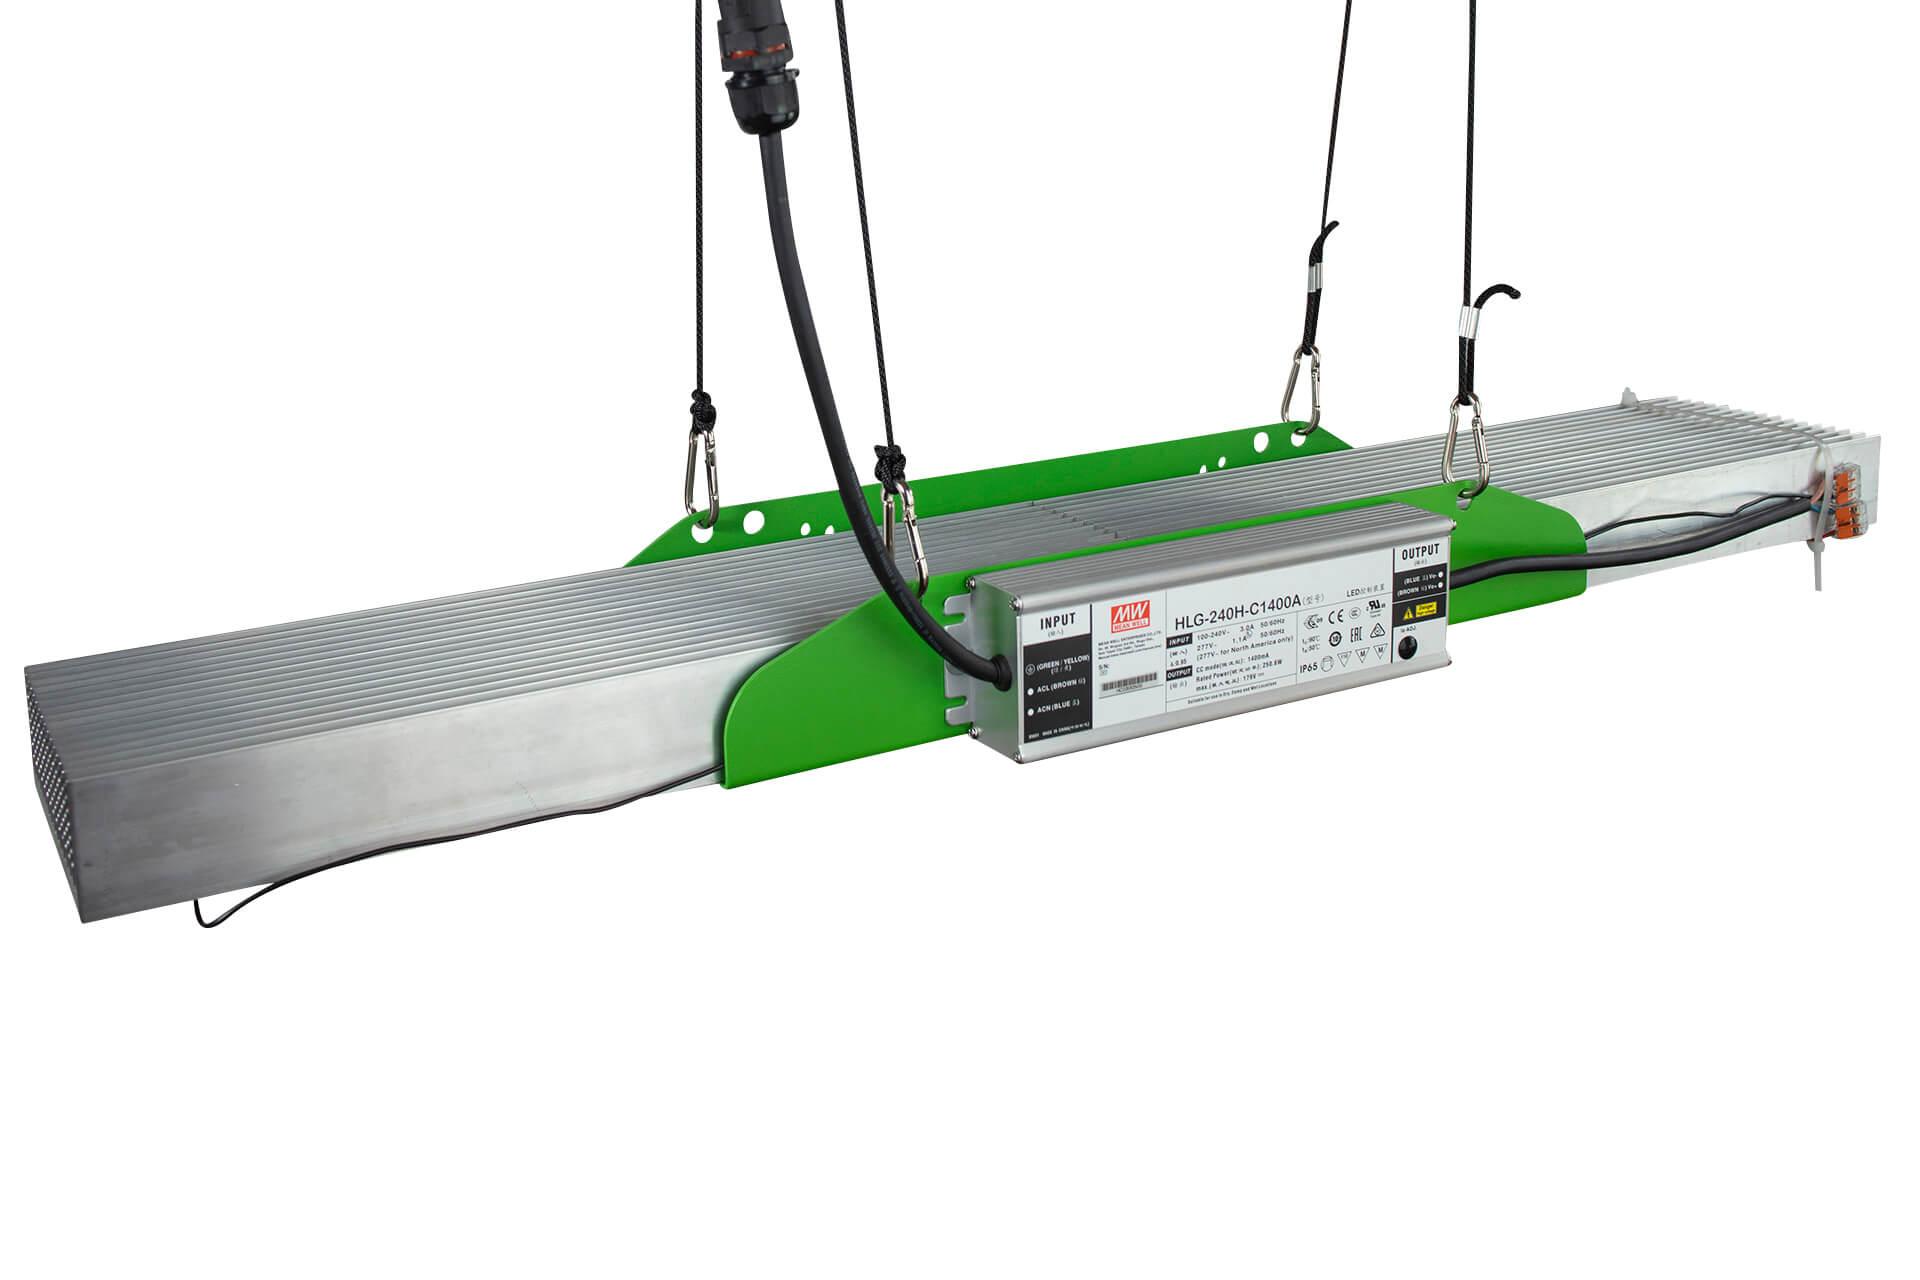 DIY-M-KIT-SMD-200w-balken-birdview-samsung-osram-led-pro-emit